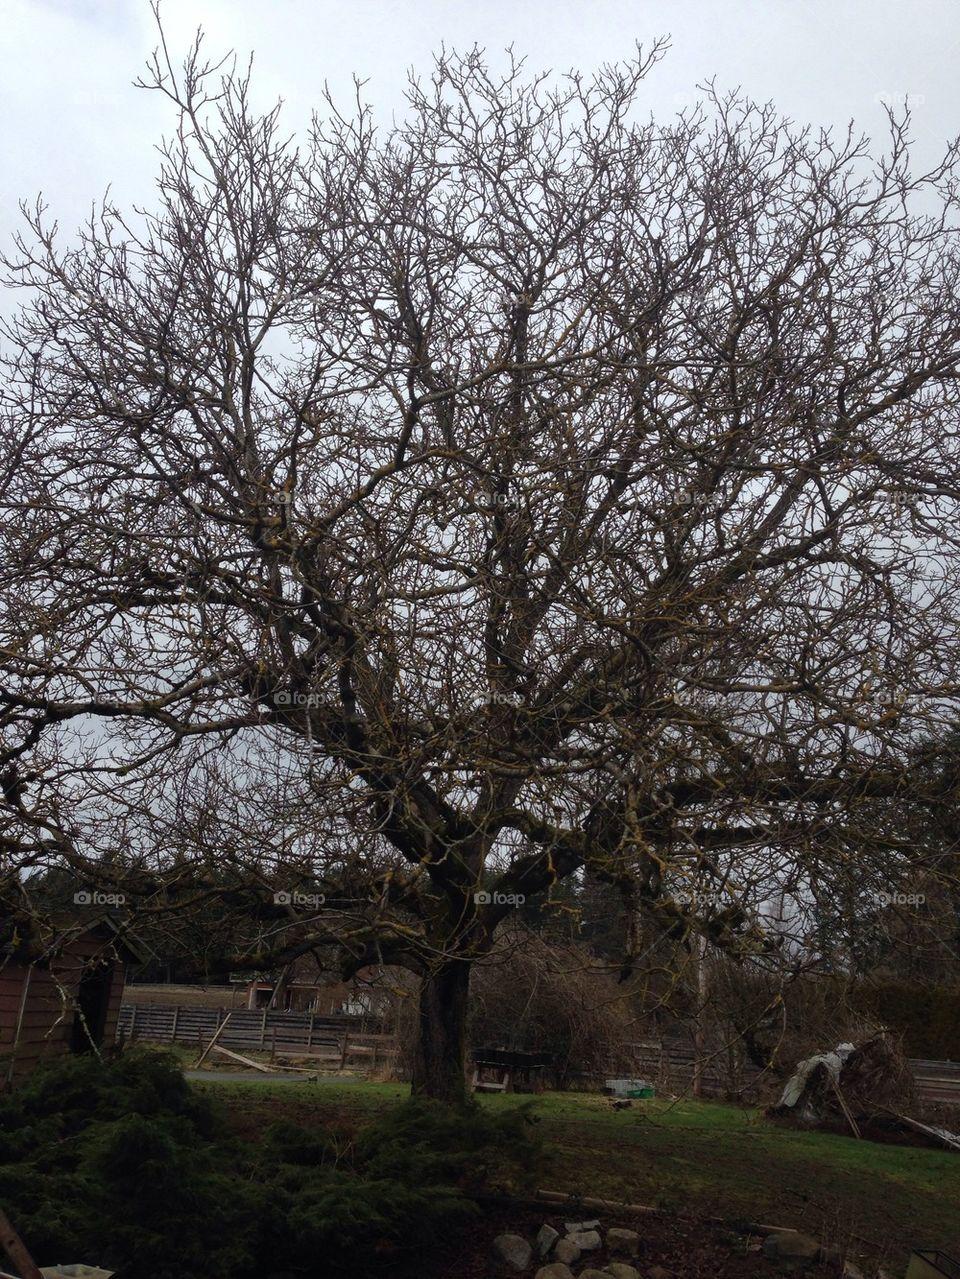 Foap com: Walnut tree stock photo by vividd